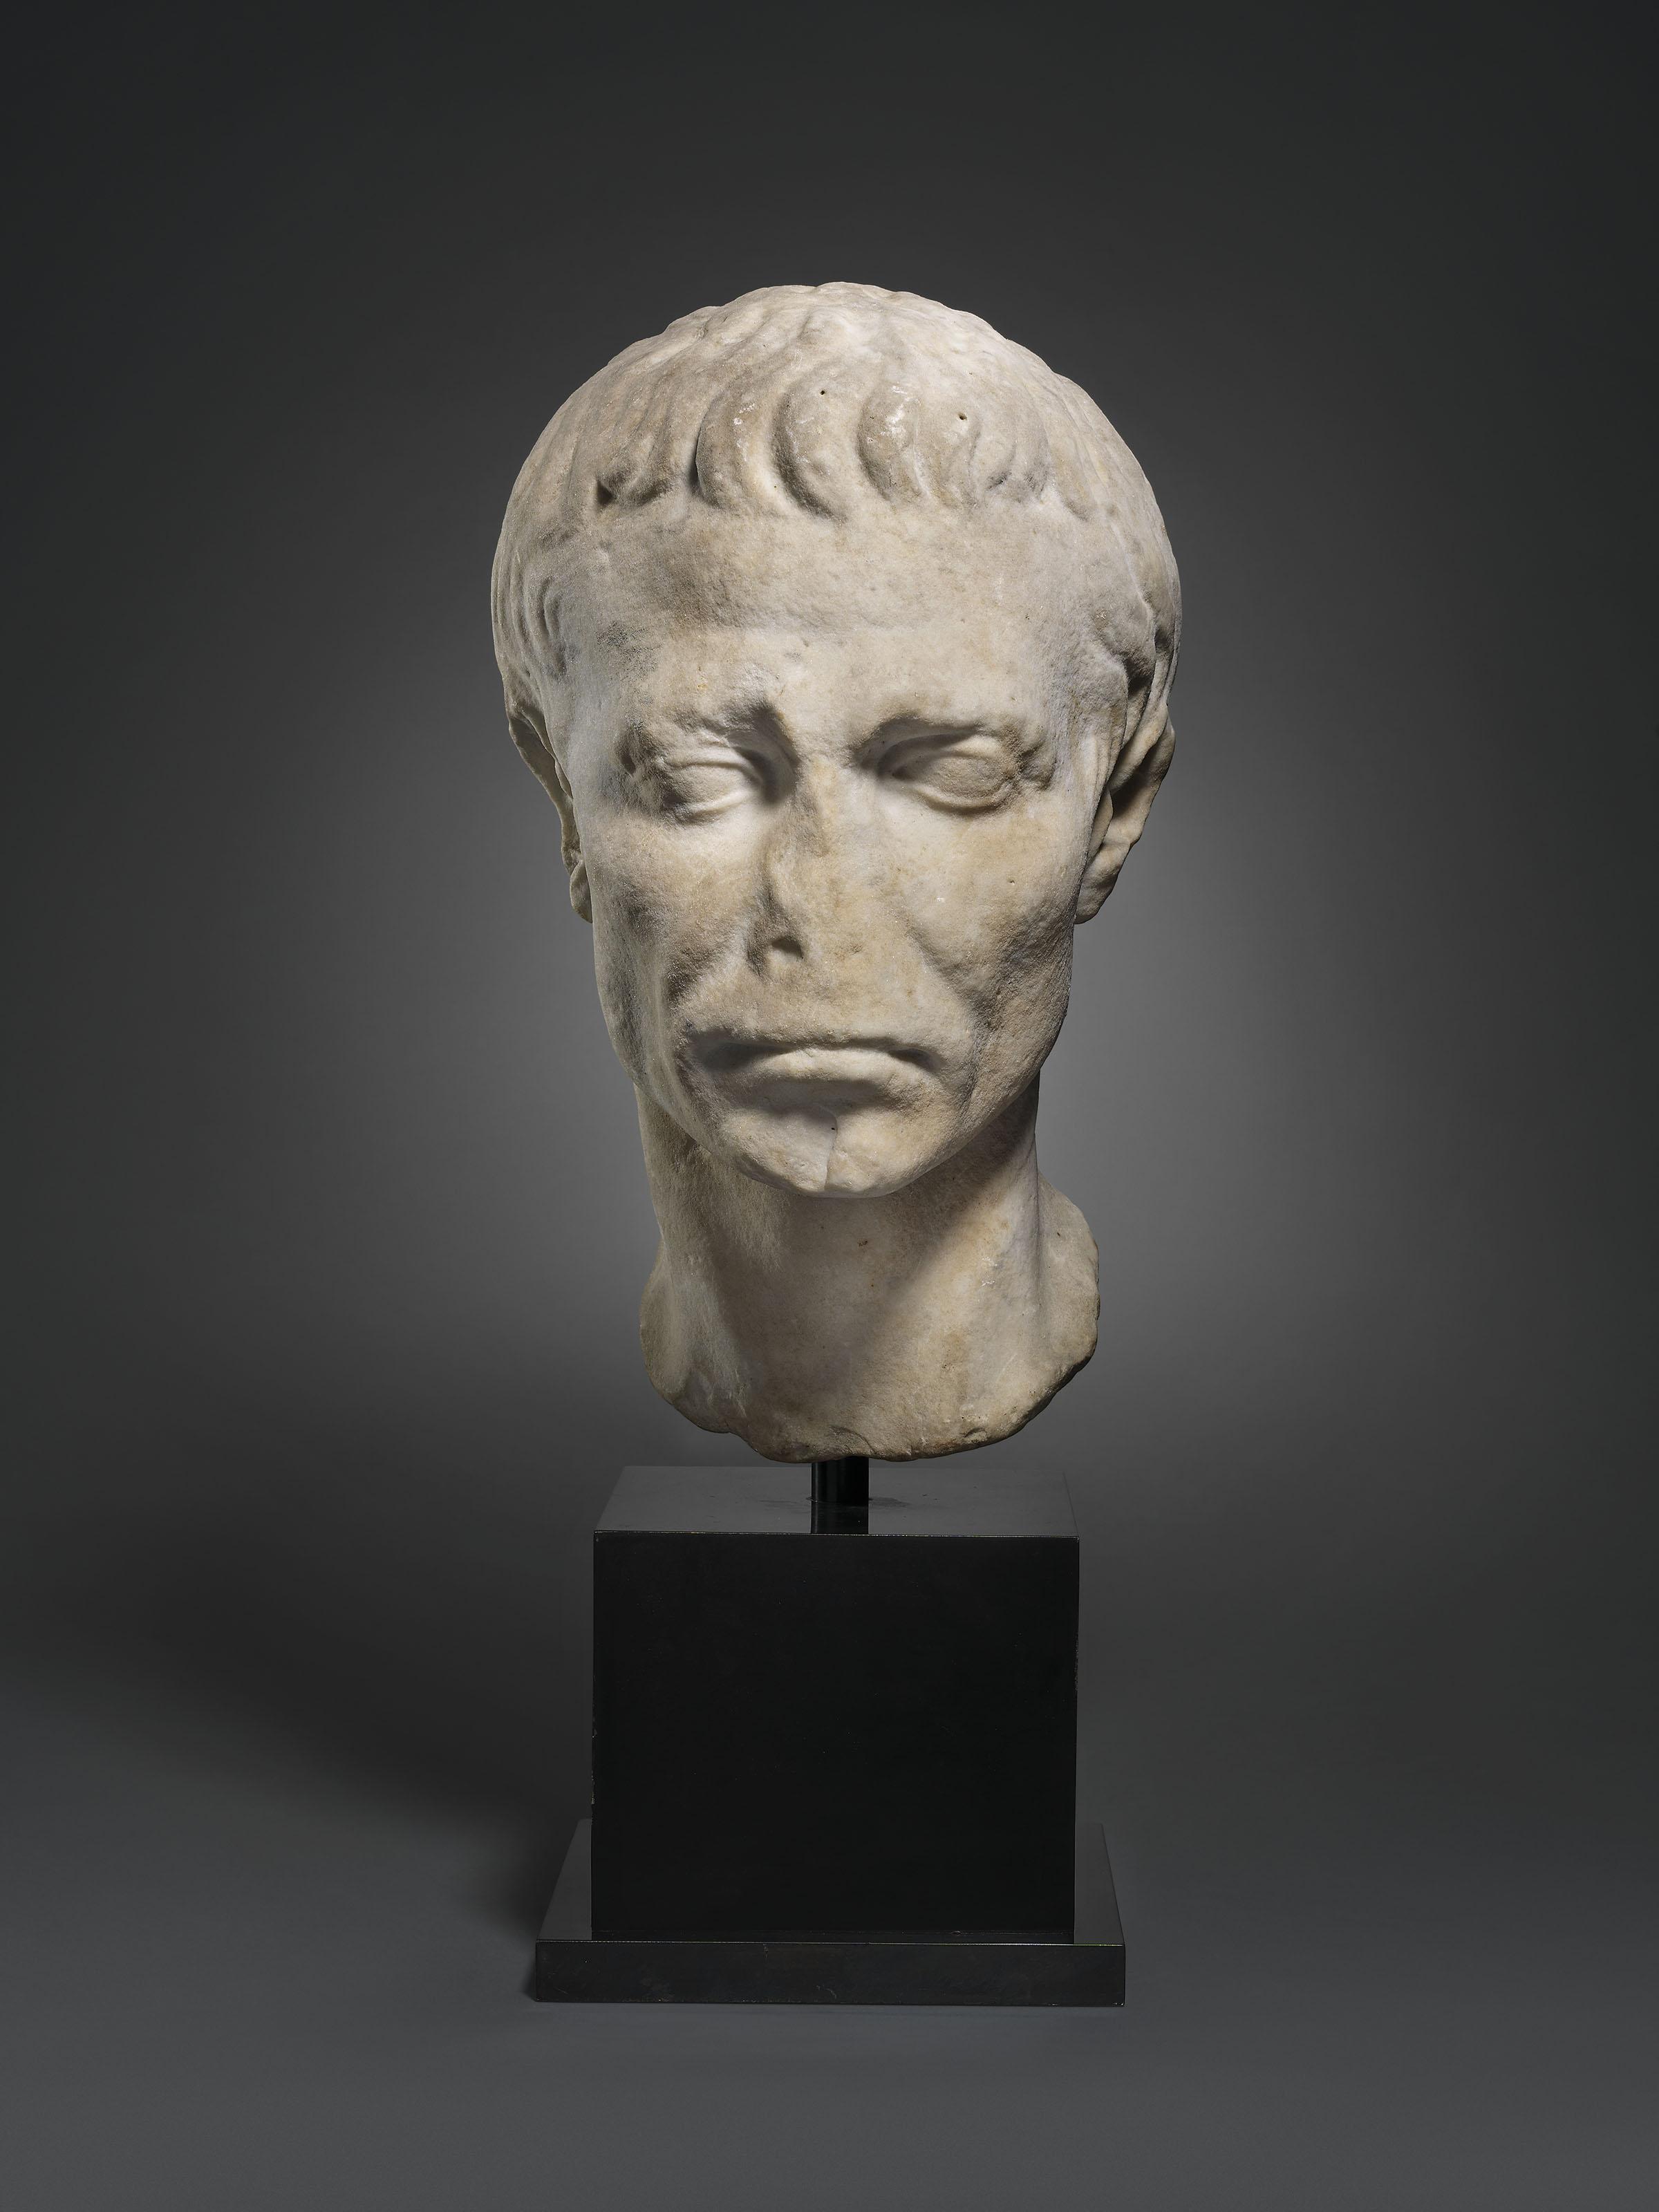 A ROMAN MARBLE PORTRAIT HEAD OF JULIUS CAESAR